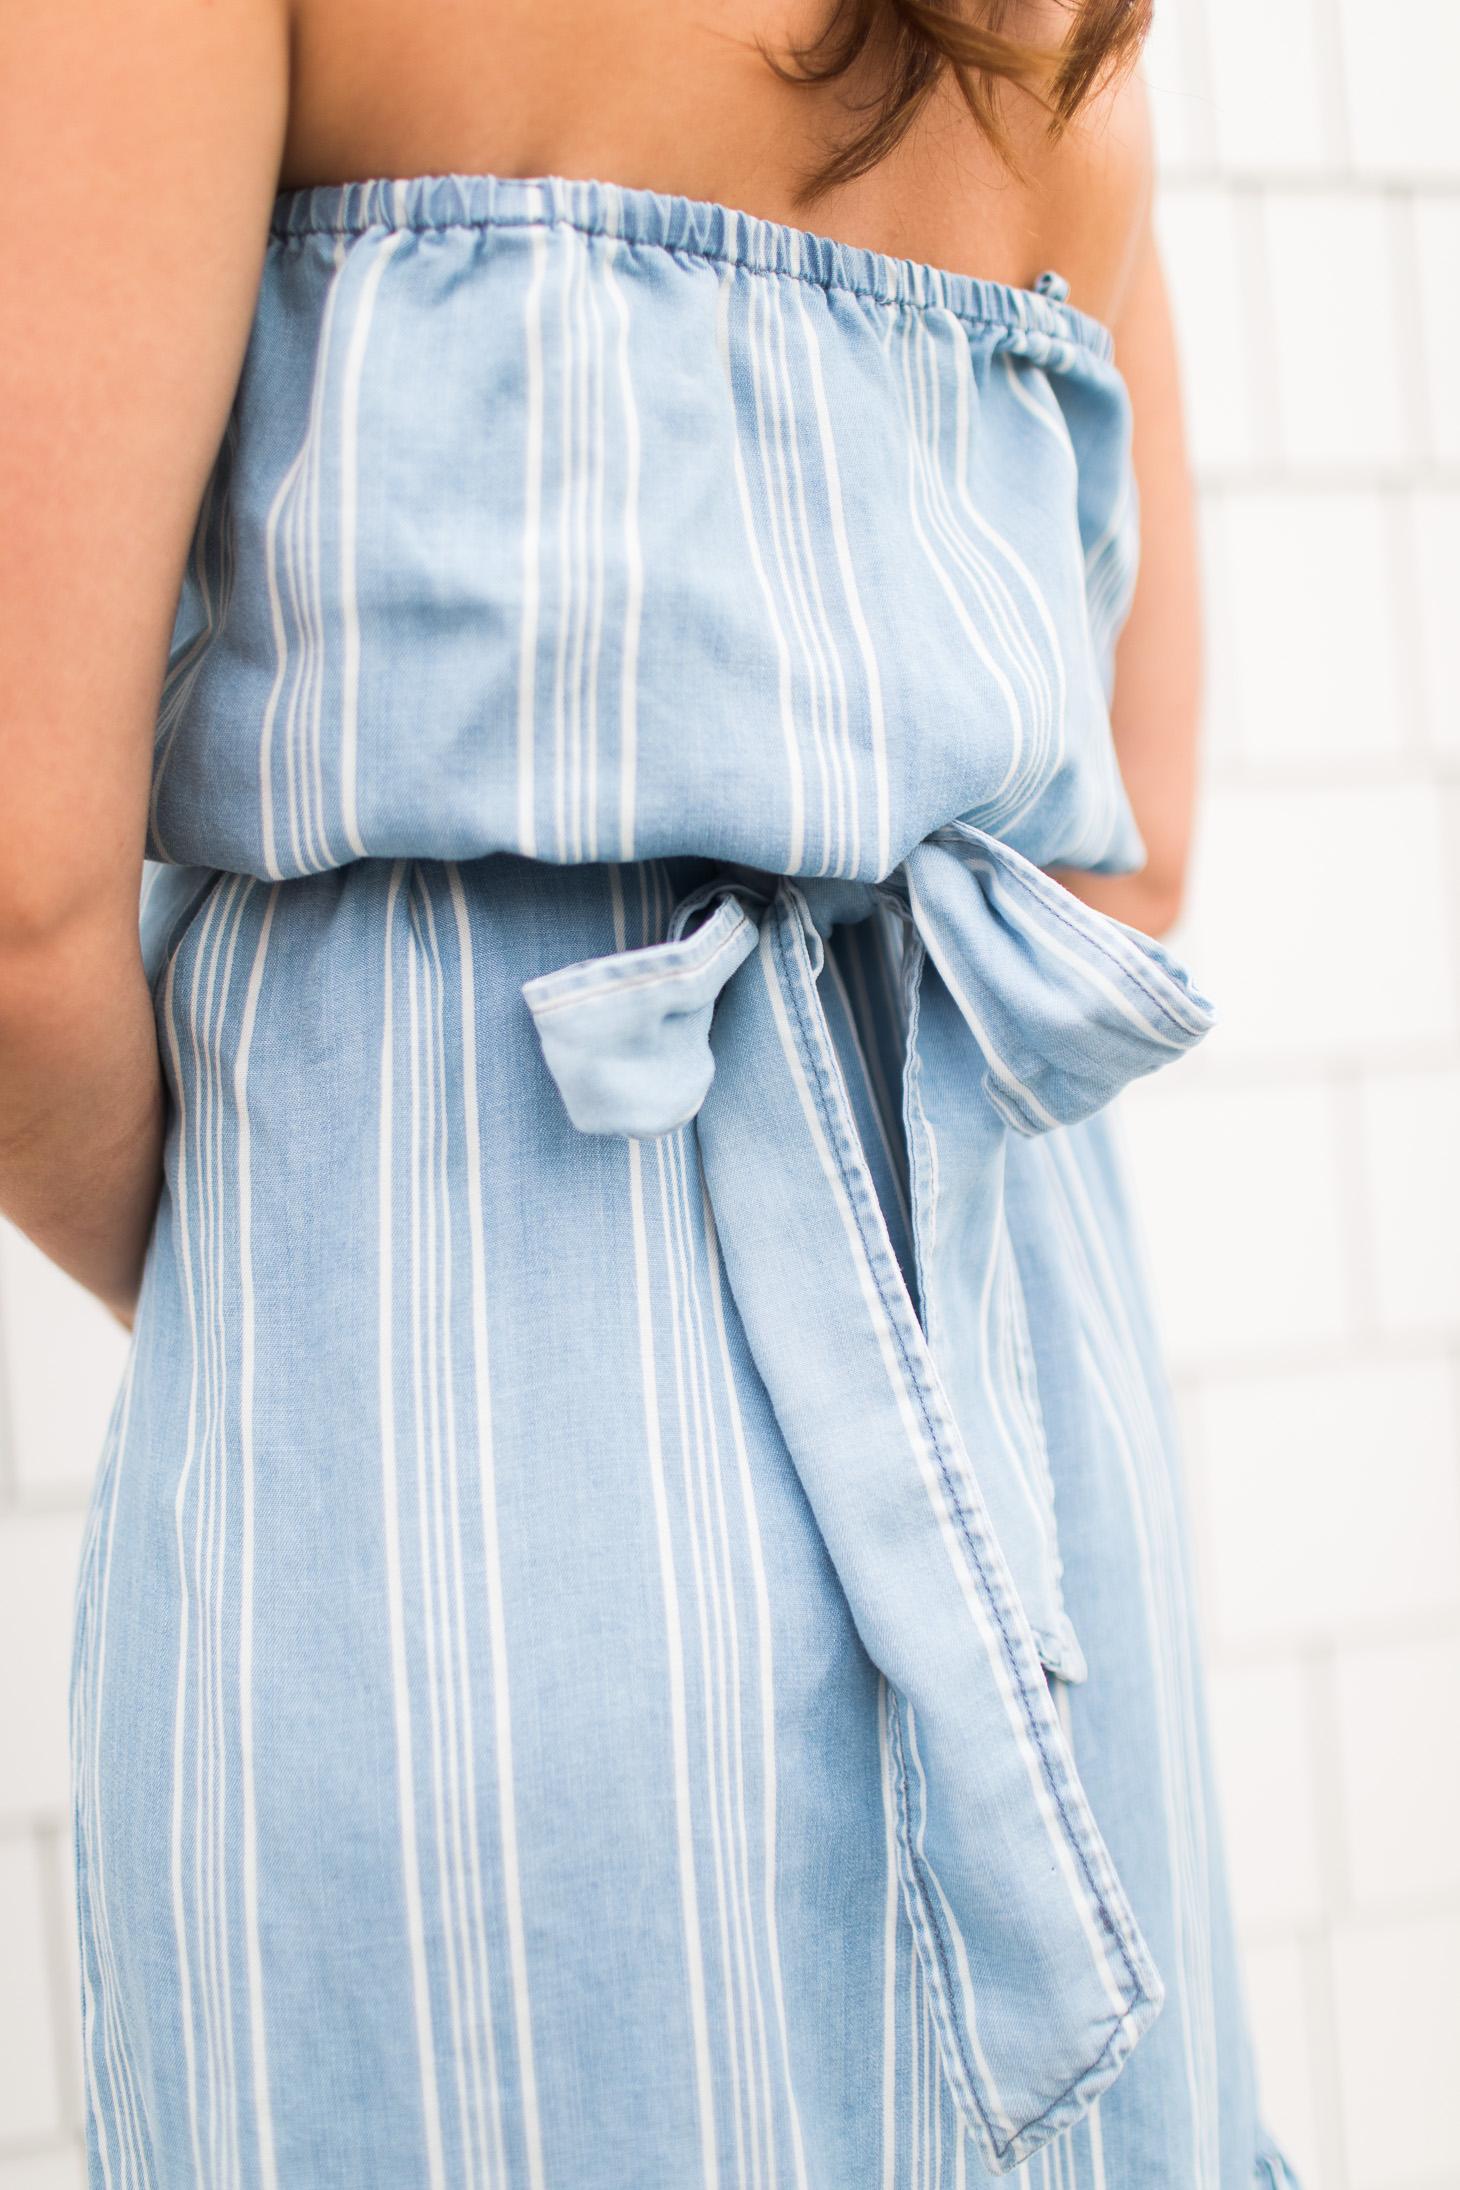 Jillian Harris Modcloth Outfits